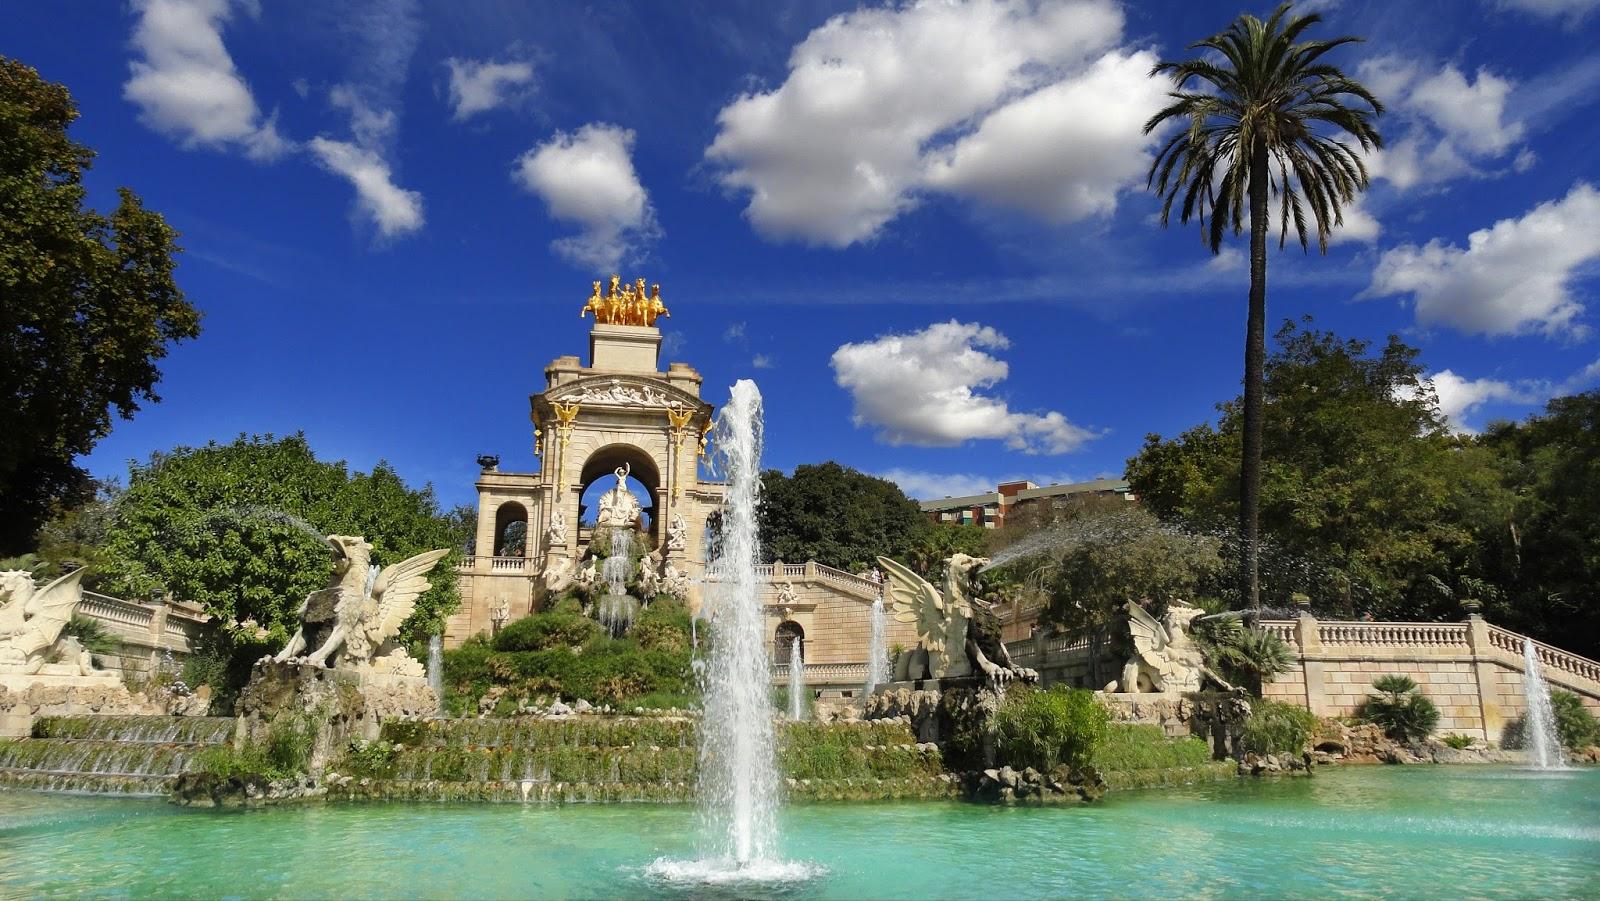 Parque de la ciutadella em barcelona dicas de barcelona for Parques de barcelona